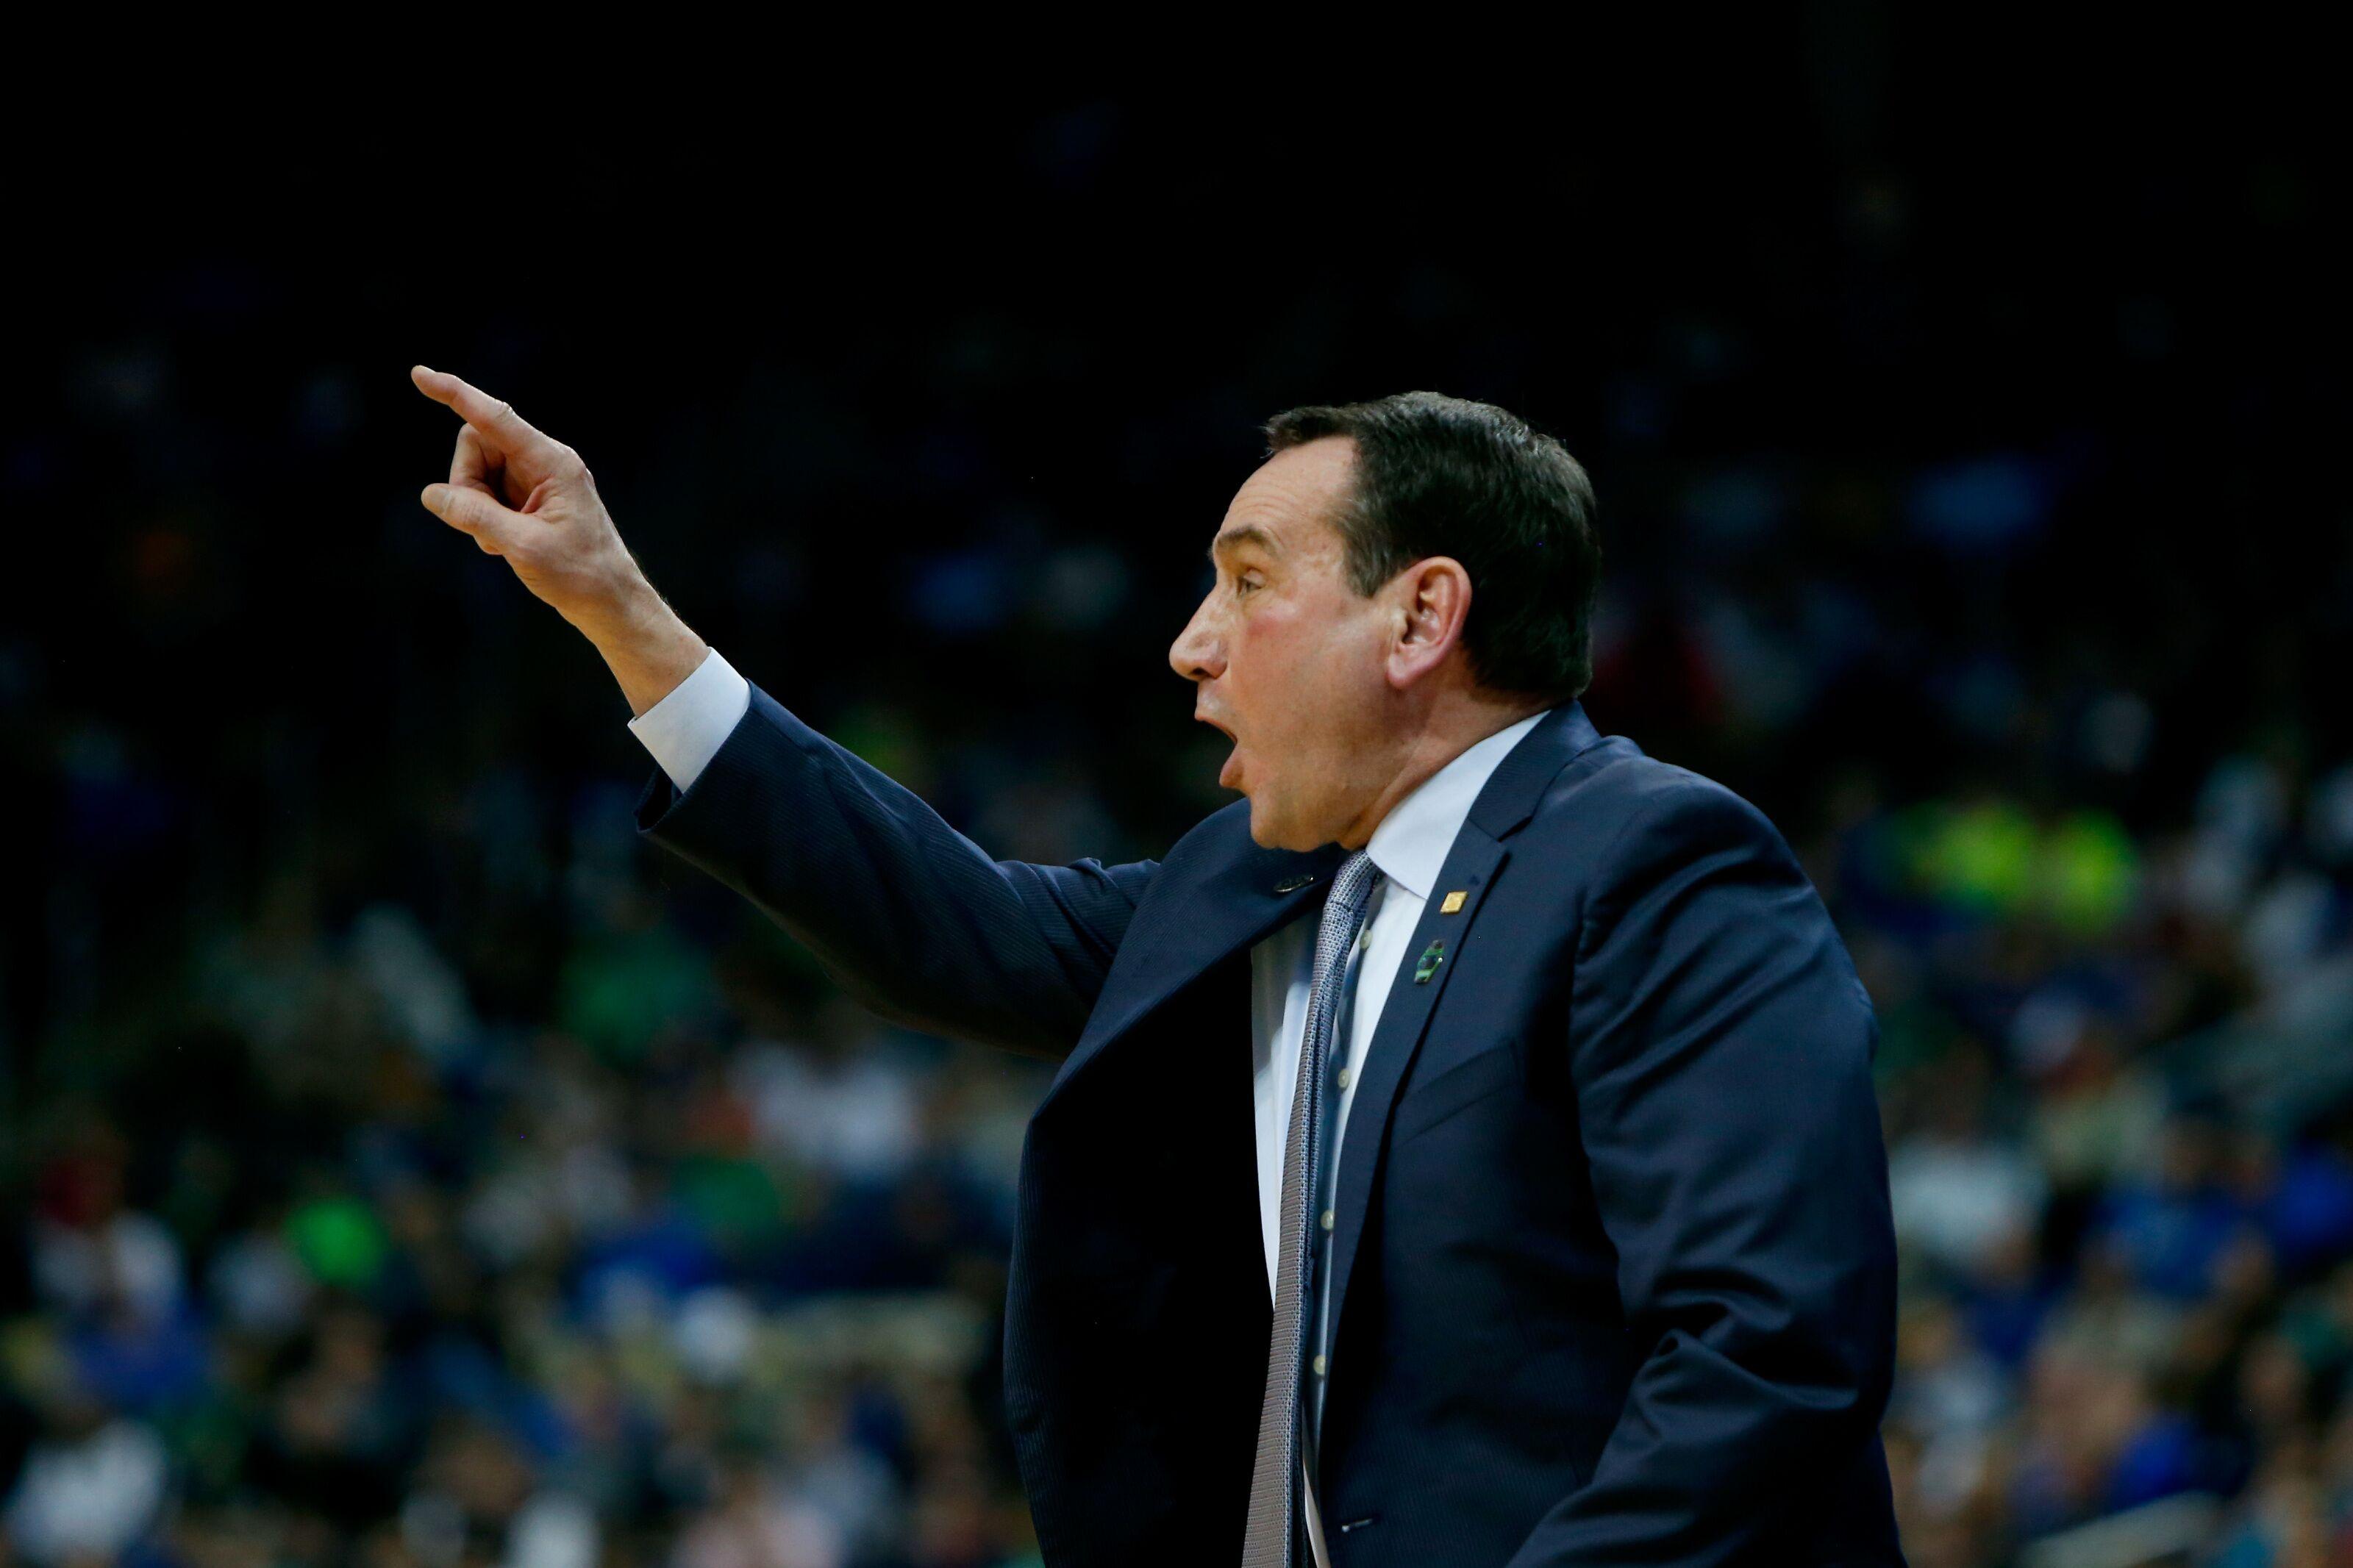 NBA then FBI, future Duke basketball savant sets sights high